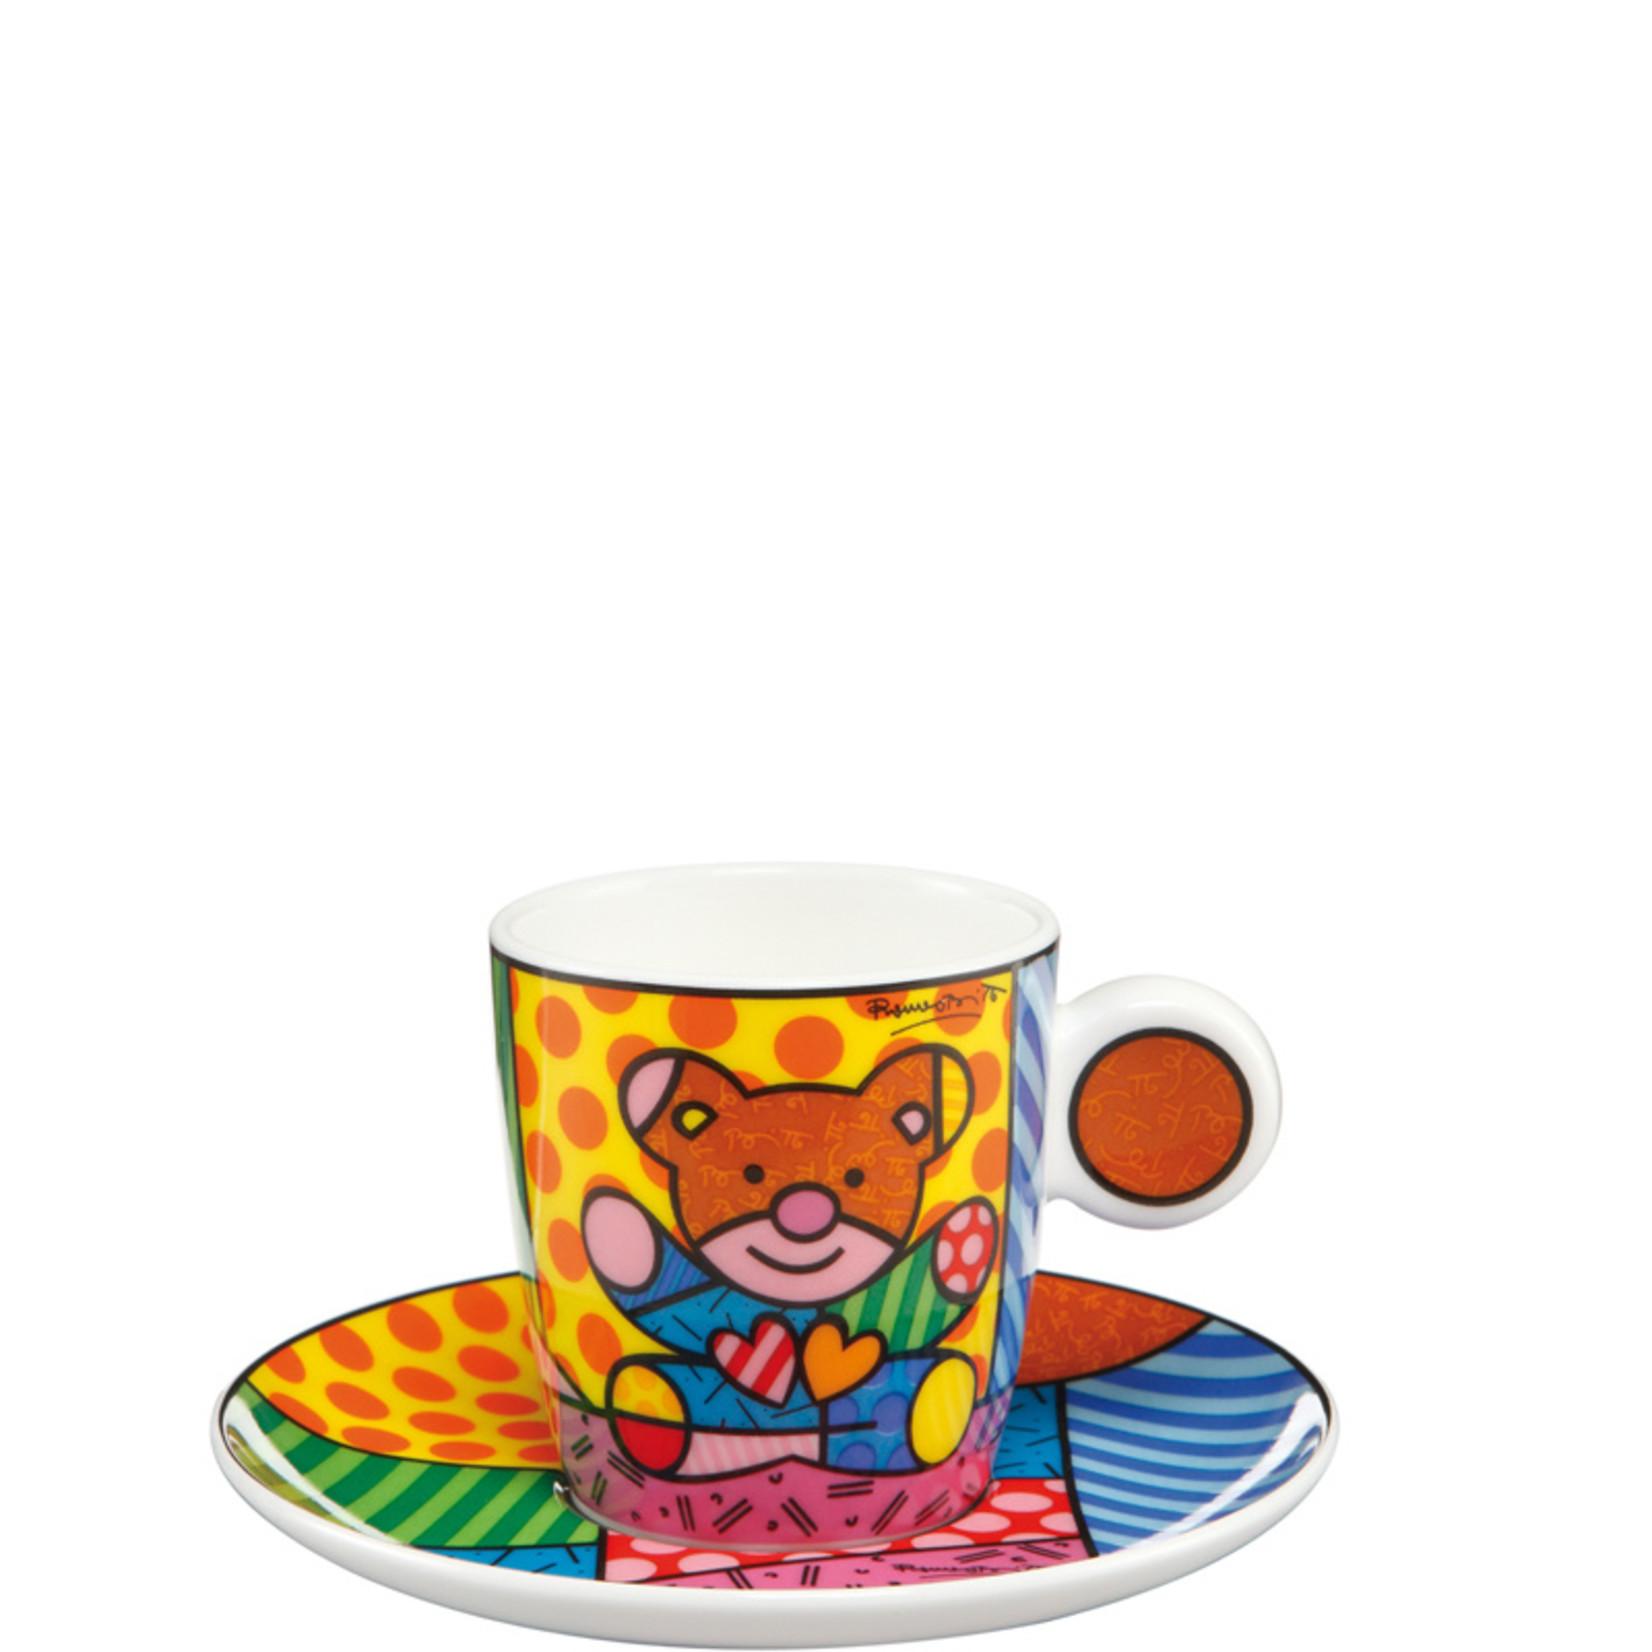 Goebel Porzellanmanufaktur Espressotasse Truly Yours | Romero Britto | Goebel Porzellan